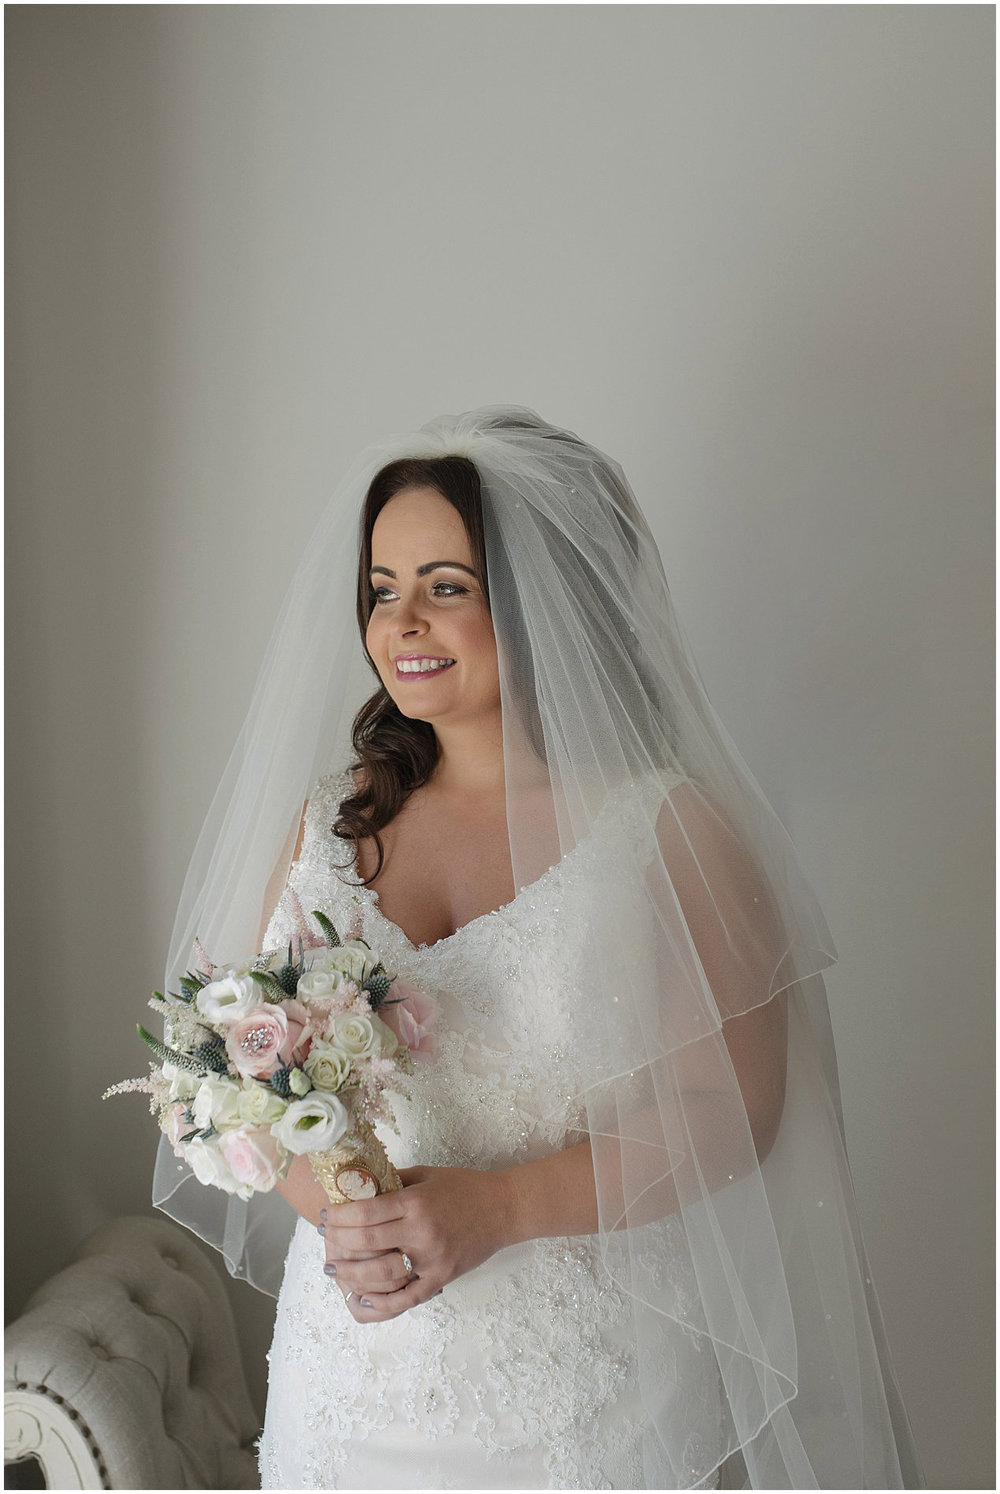 Shauneen_PJ_Hillgrove_Hotel_Monaghan_Wedding_jude_browne_photography_0014.jpg